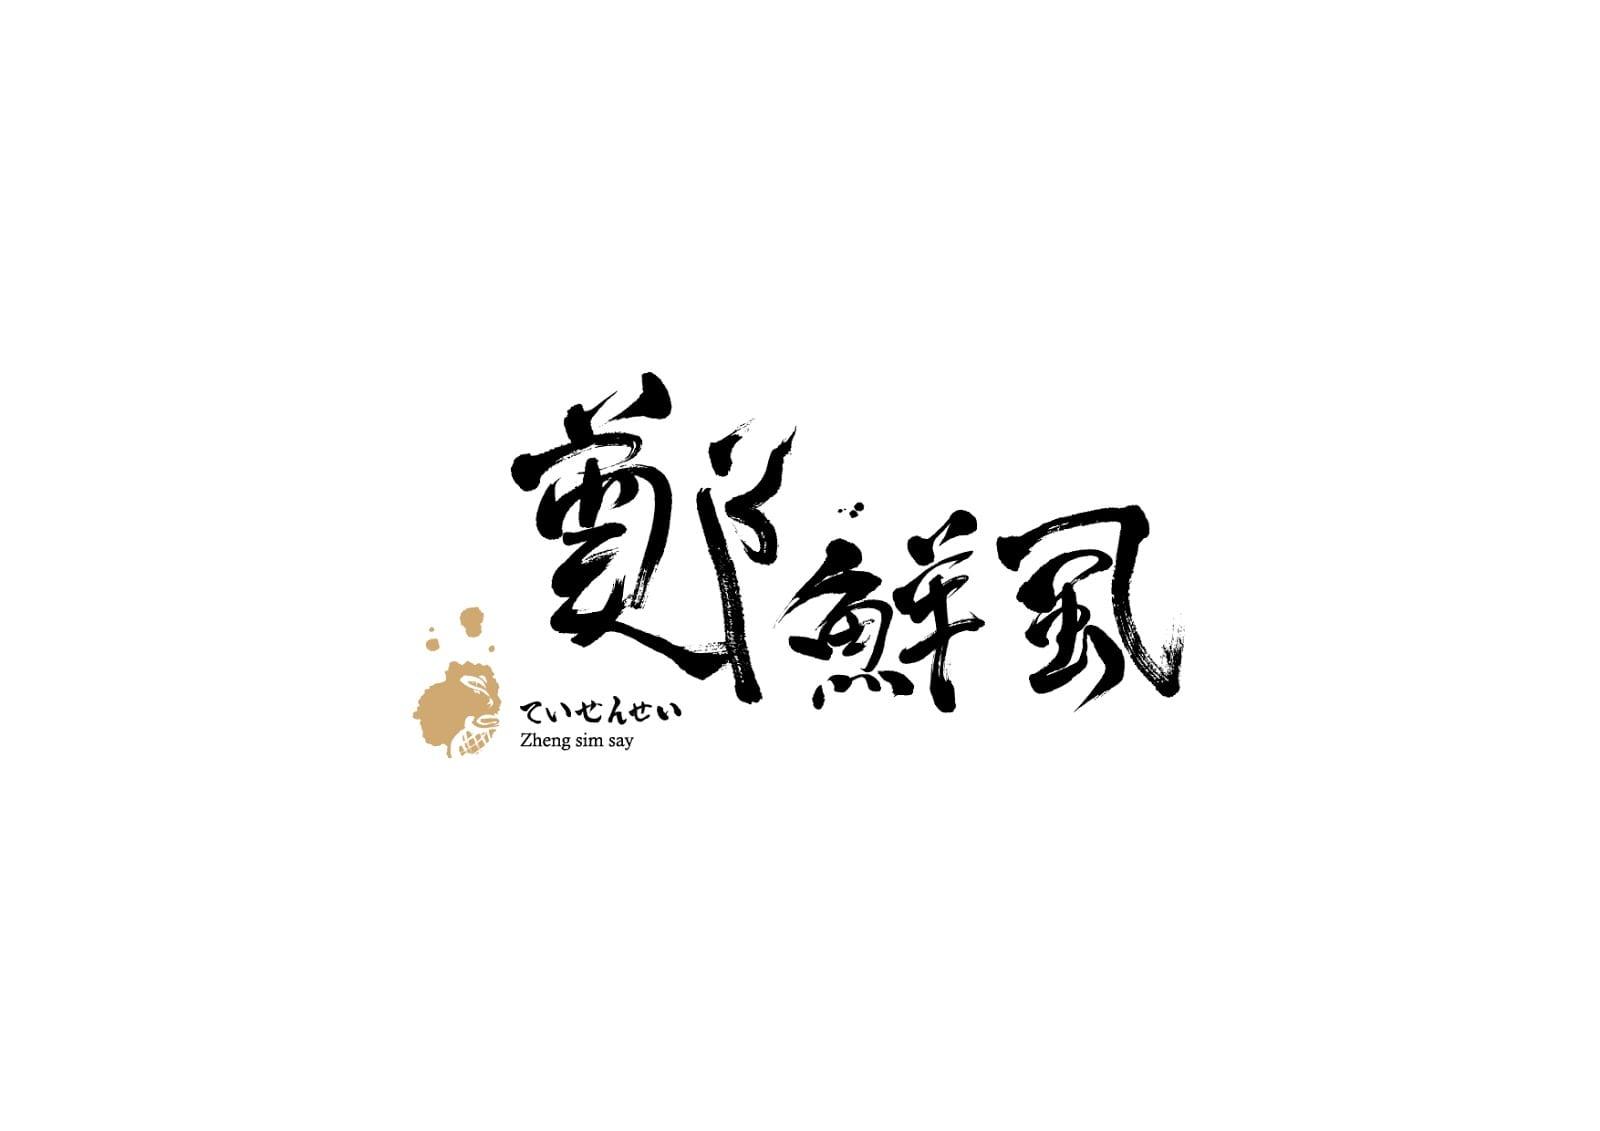 SHI BI SHOU 01 - Ach, tie obaly – Shi Bi Shou